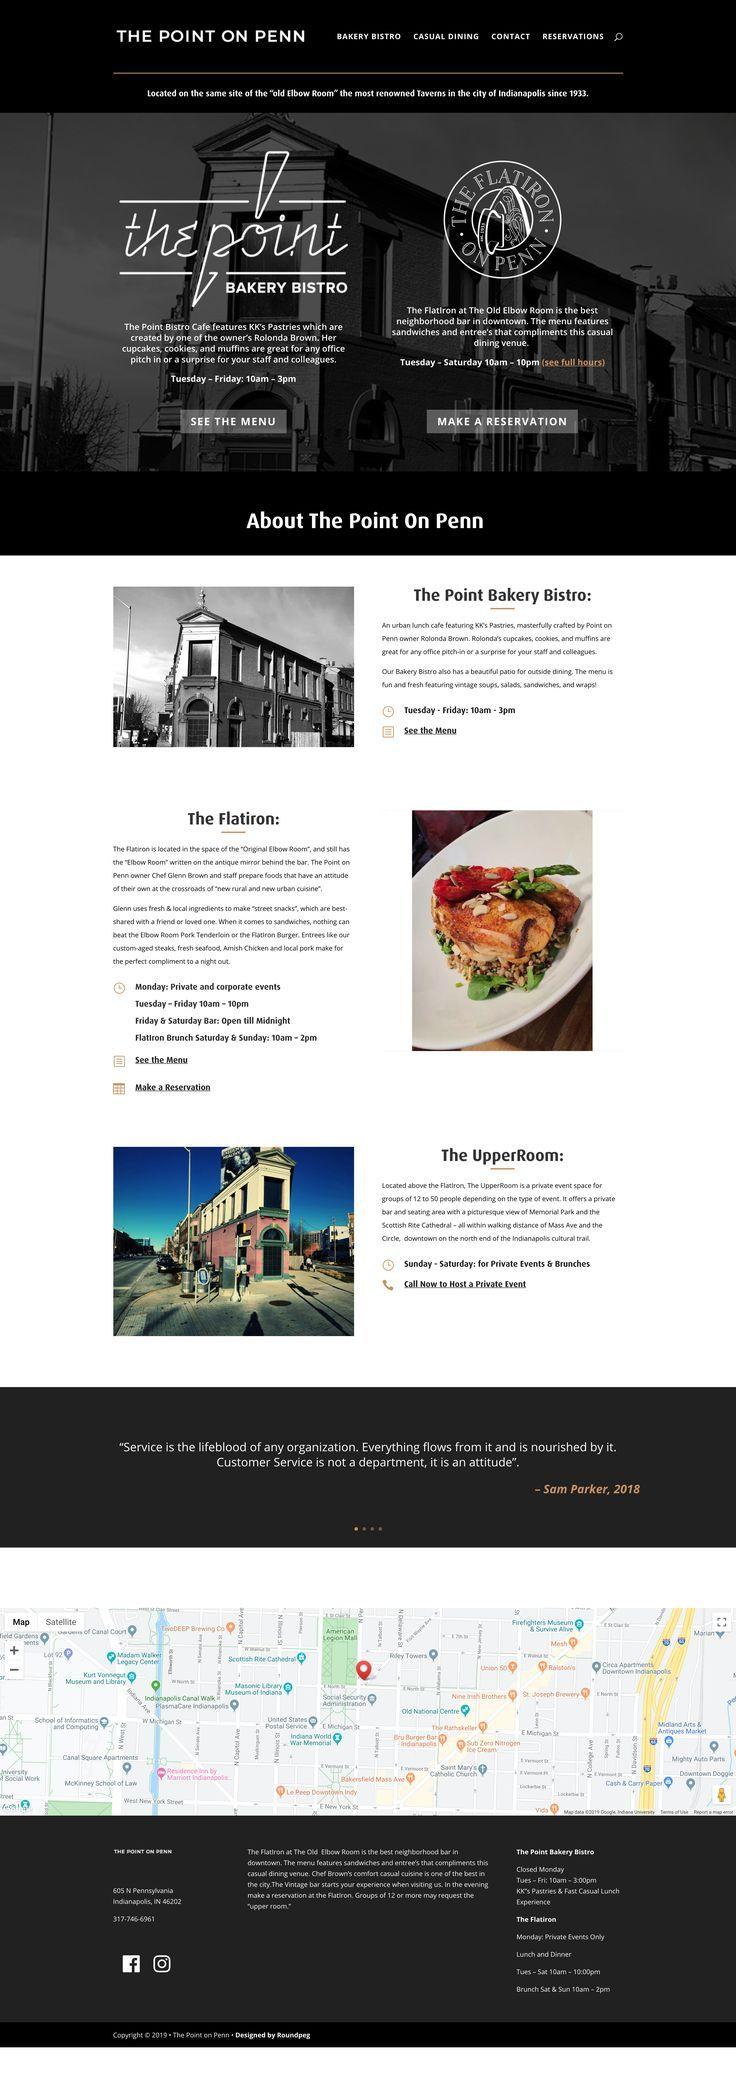 The Point On Penn Logo Design Web Design Example Roundpeg Web Design Examples Web Design Small Business Web Design